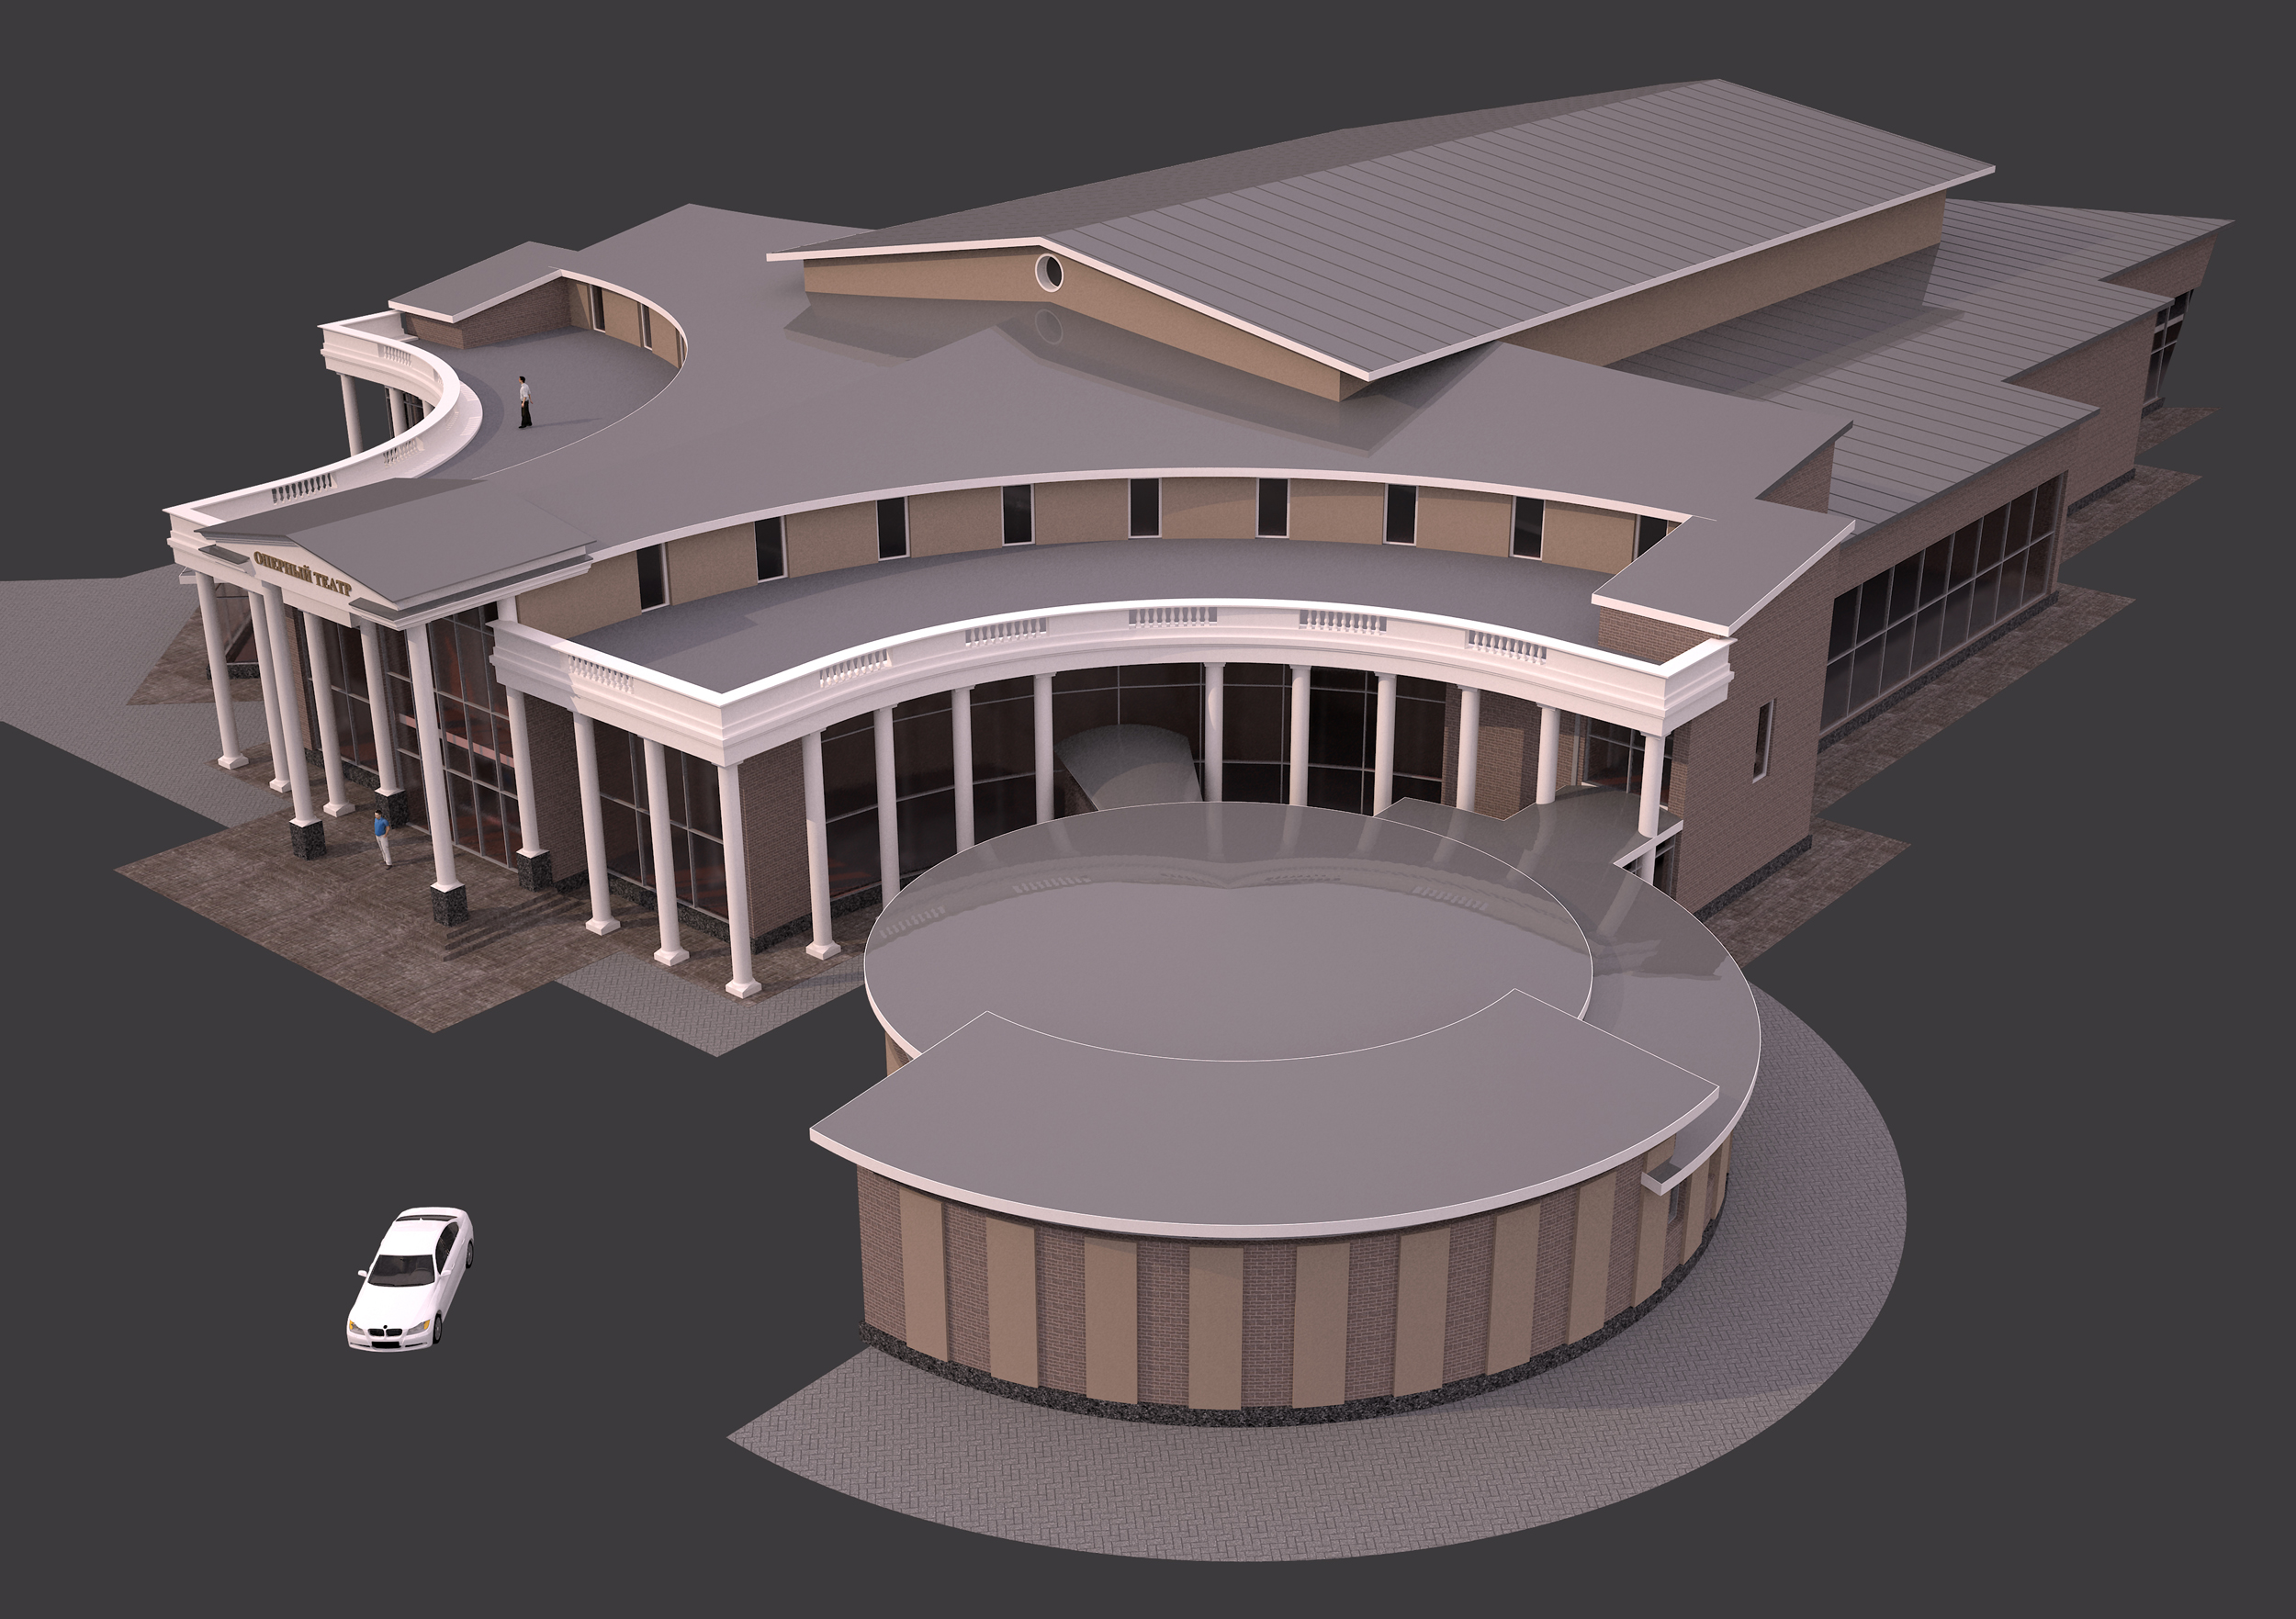 Разработка архитектурной концепции театра оперы и балета фото f_58352f5bd4ce3f0d.jpg